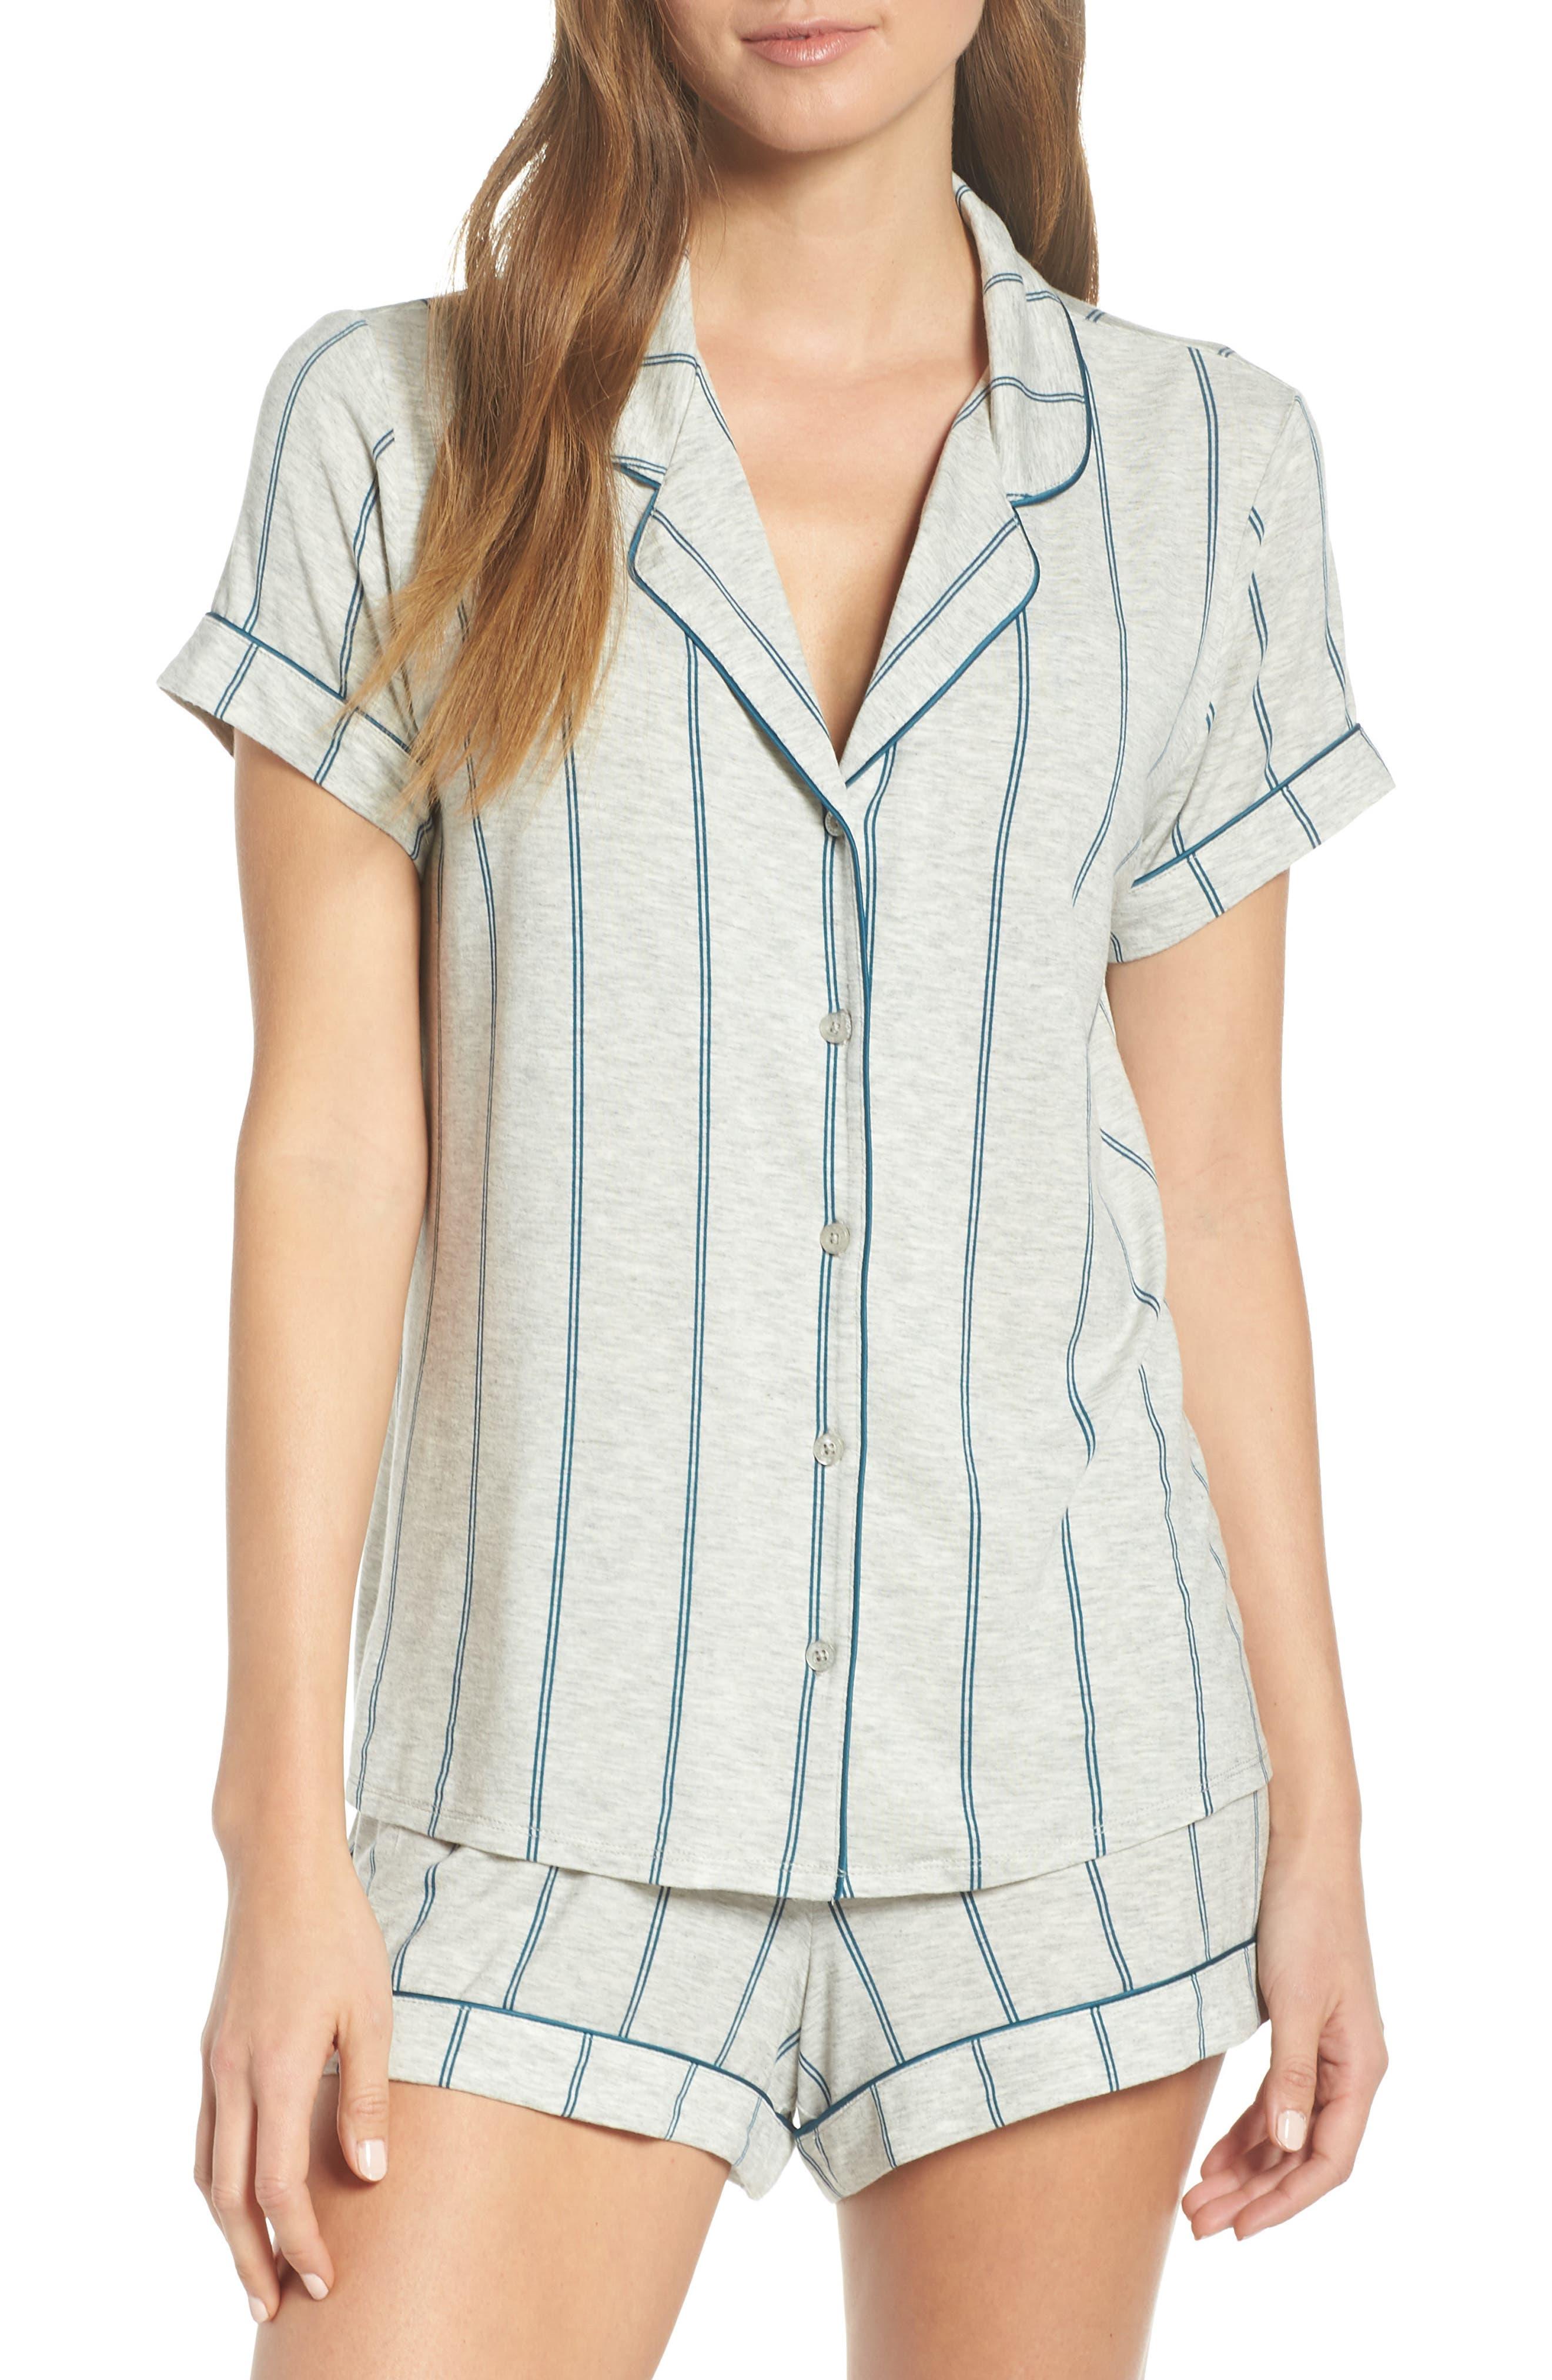 NORDSTROM LINGERIE Moonlight Short Pajamas, Main, color, GREY PEARL HTR MICRO STRIPE